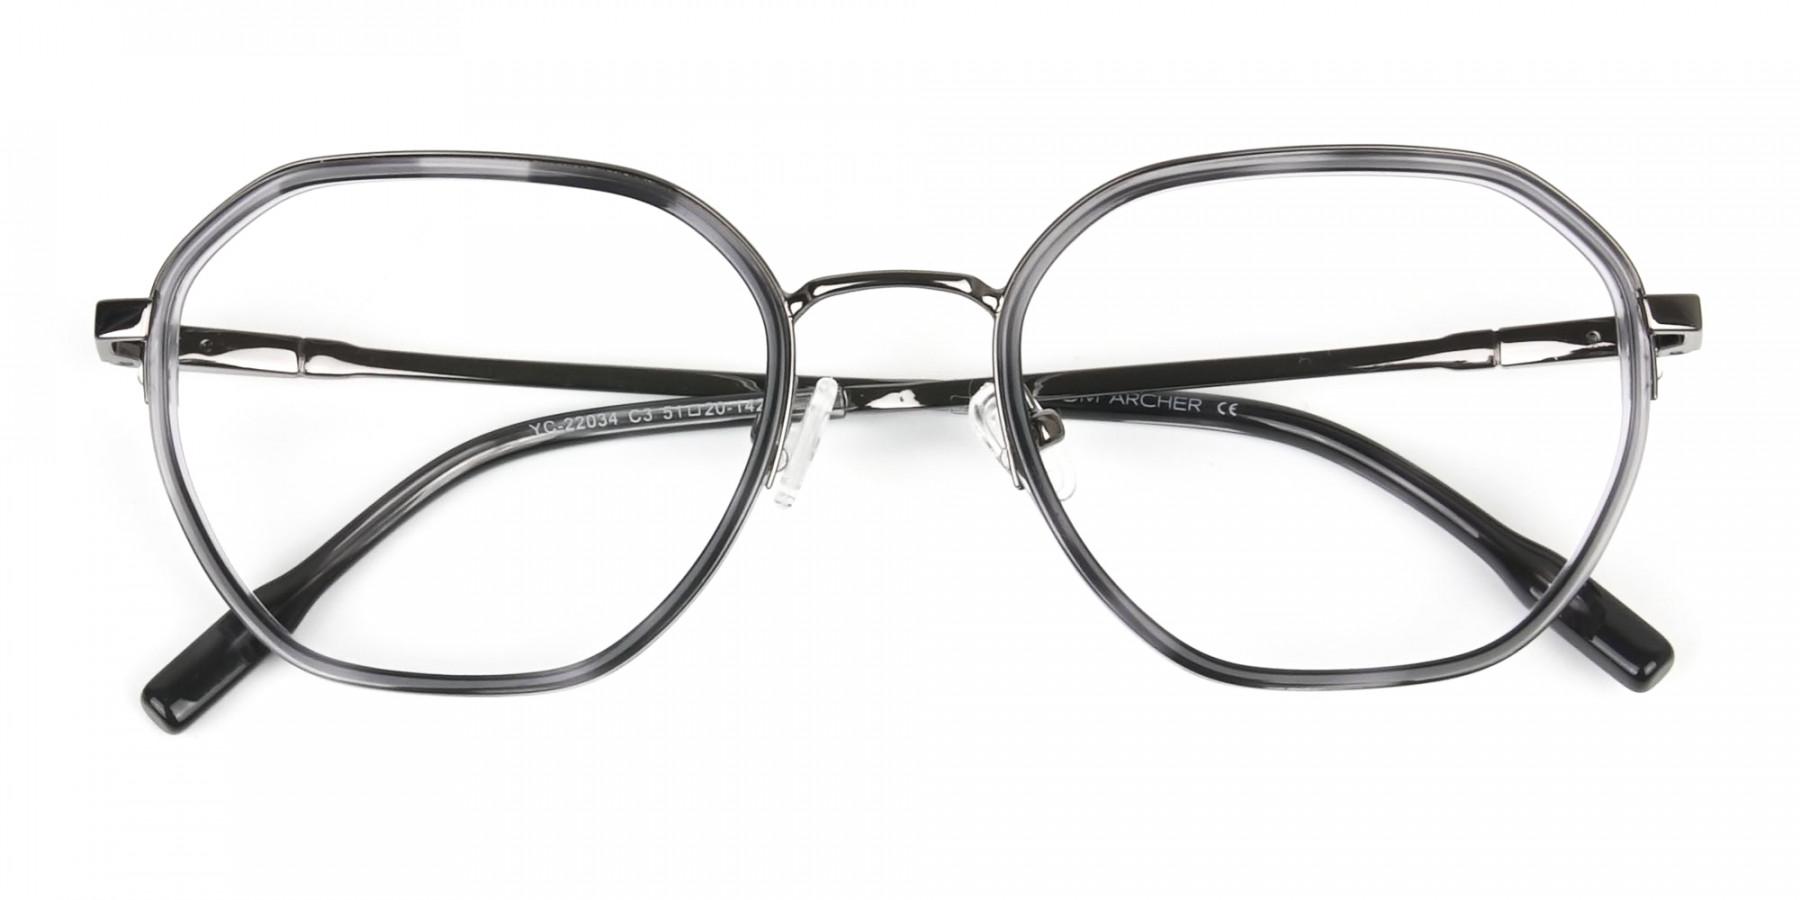 Gunmetal and Dusty Blue Geometric Glasses in Gunmetal  - 1